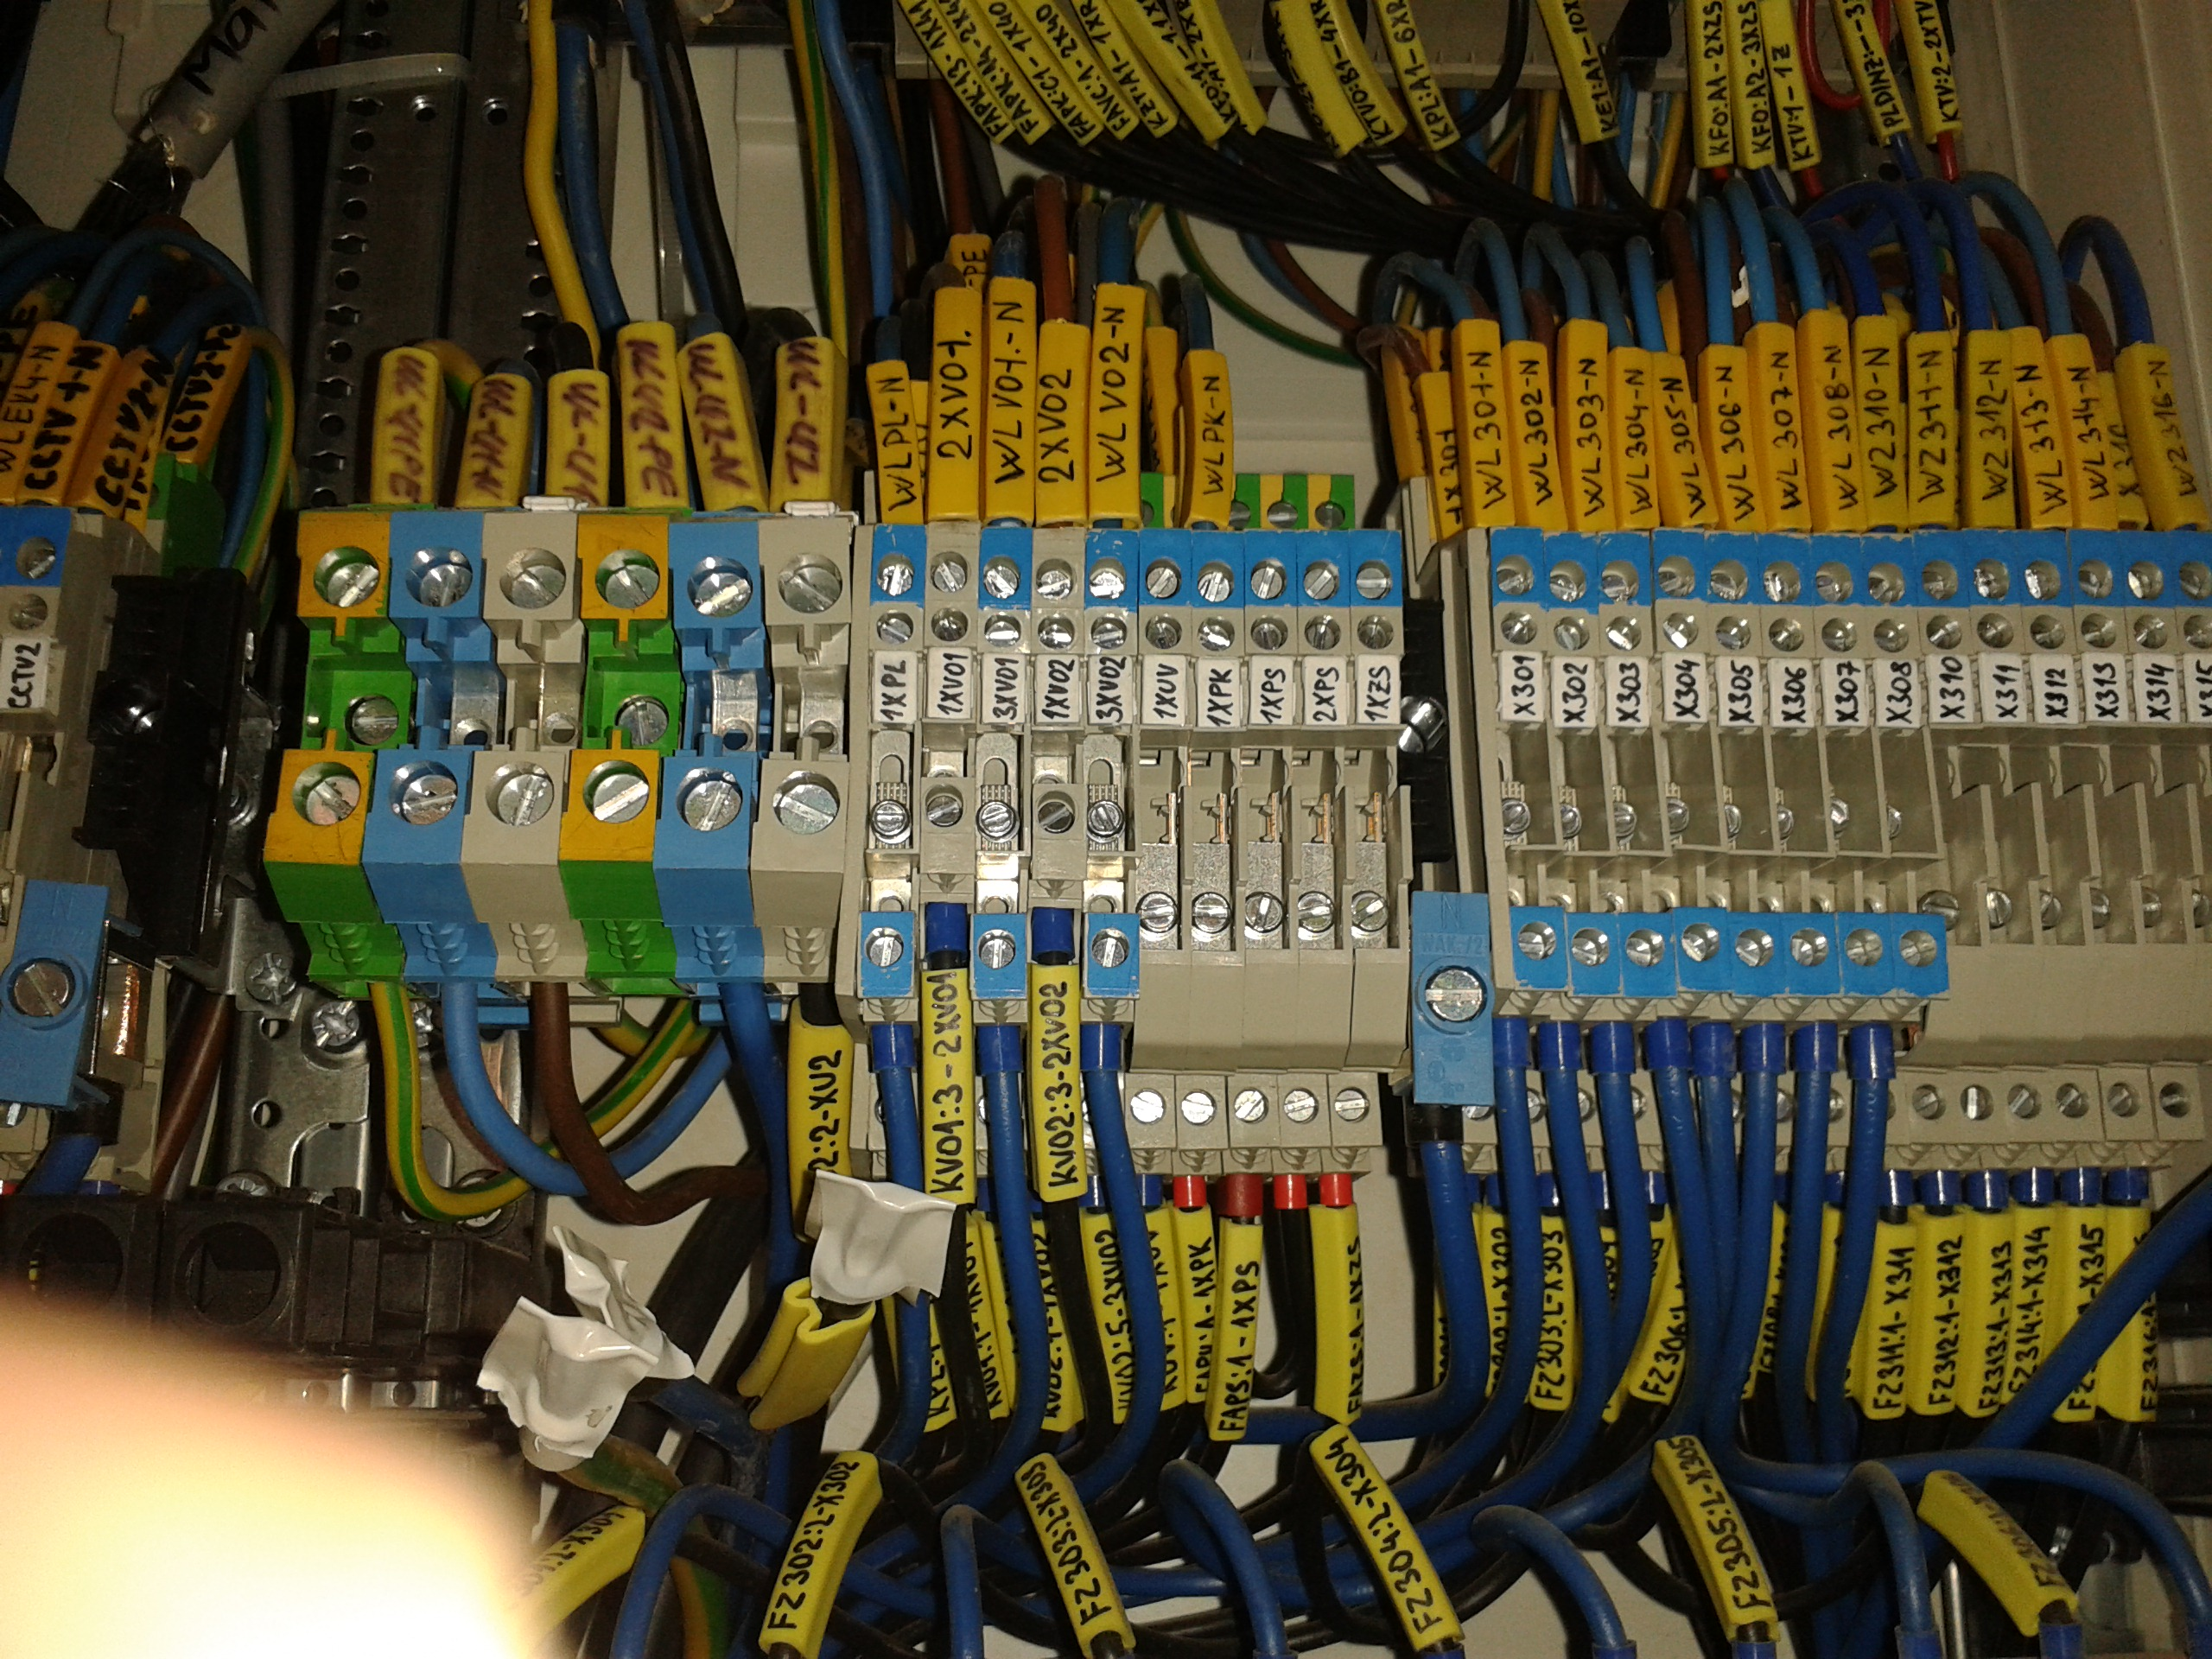 priemyslene haly elektroinstalacia